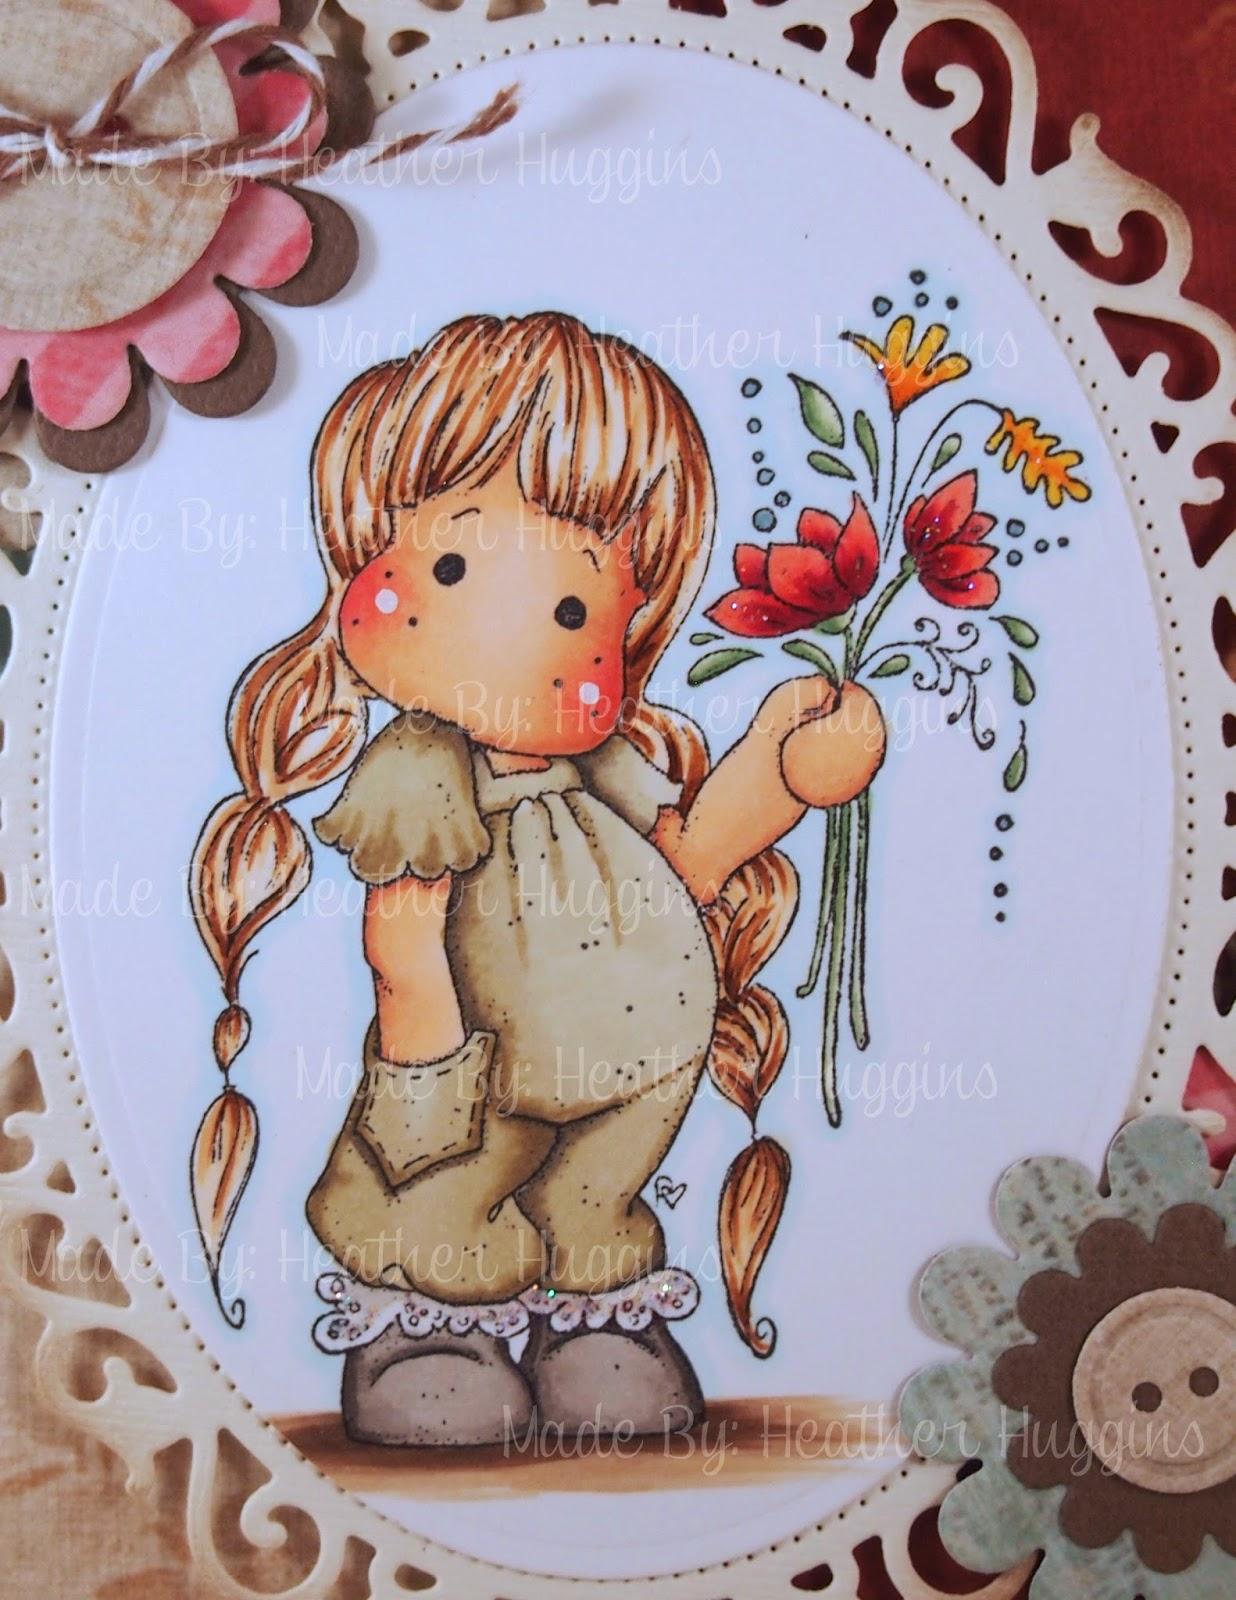 Heather's Hobbie Haven - Tilda with Little Pockets Card Kit